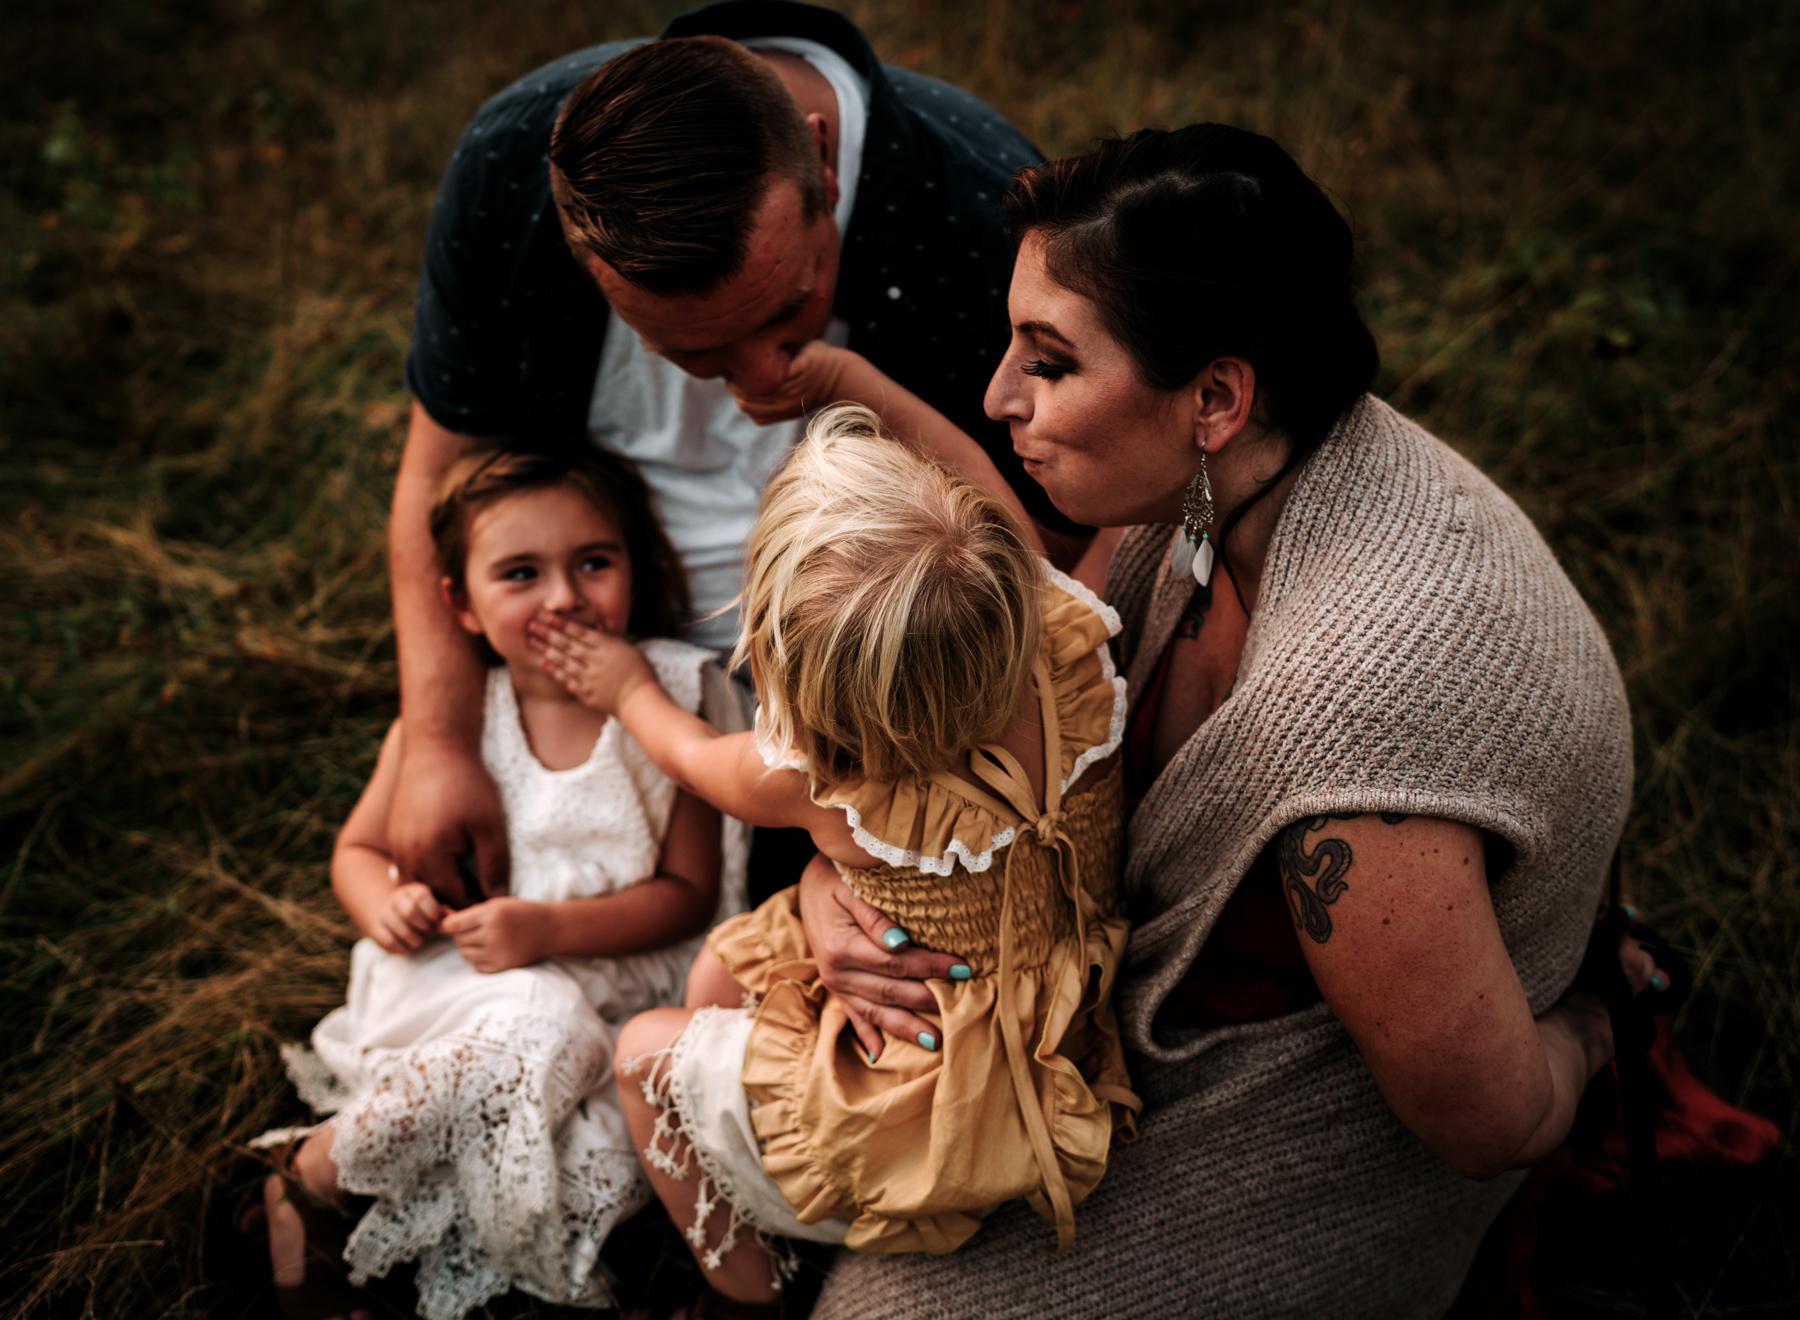 anchoragefamilyphotographer93.jpg